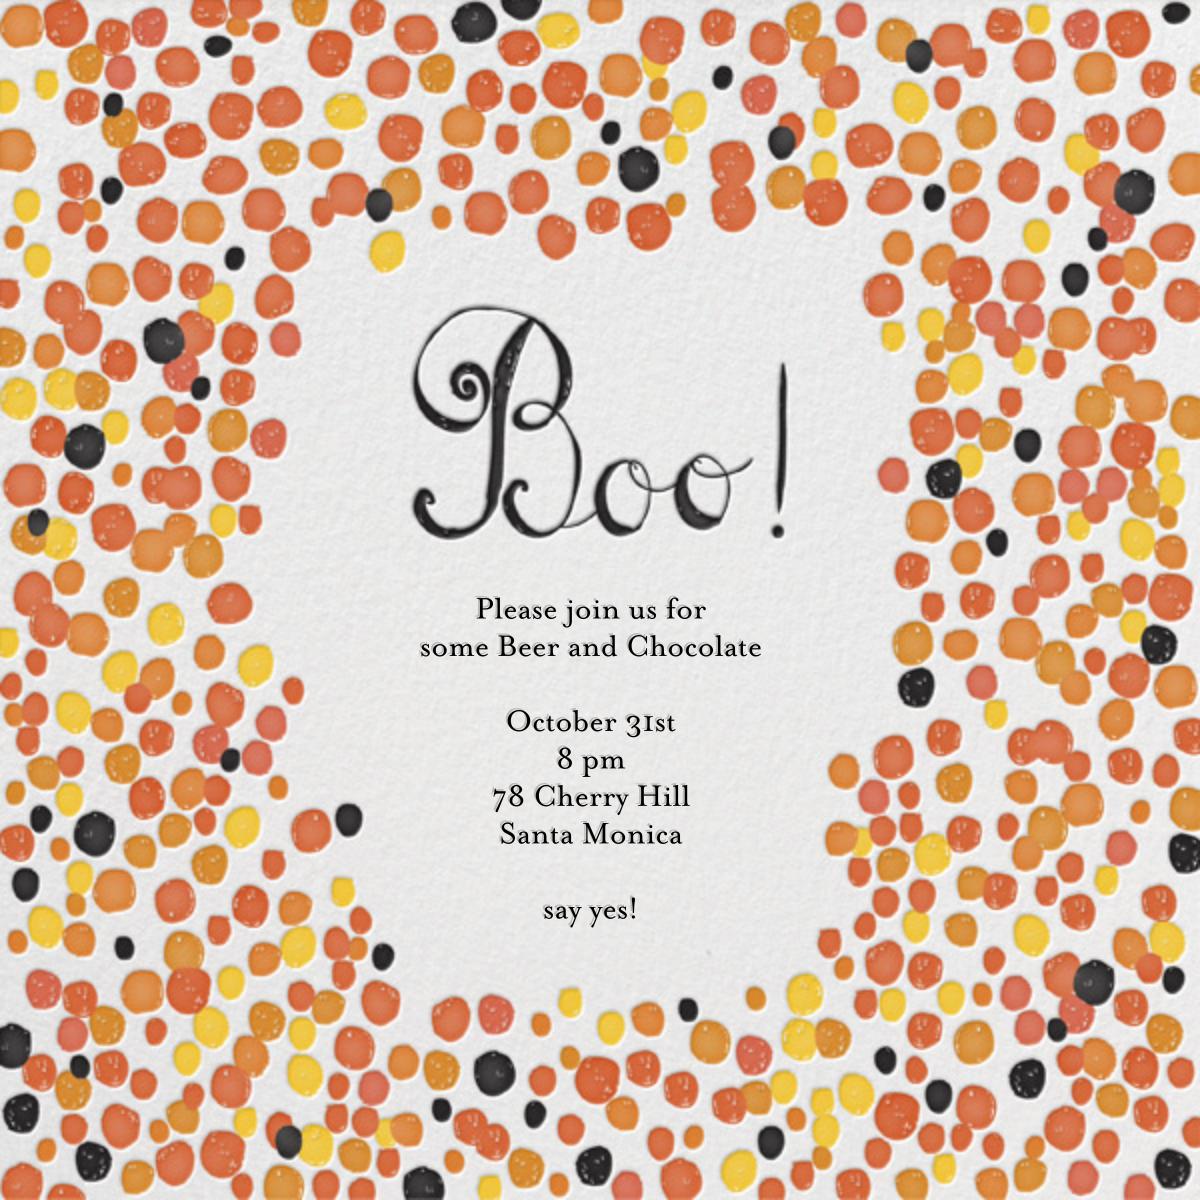 Chocolates for Candy Corns - Mr. Boddington's Studio - Kids' Halloween invitations